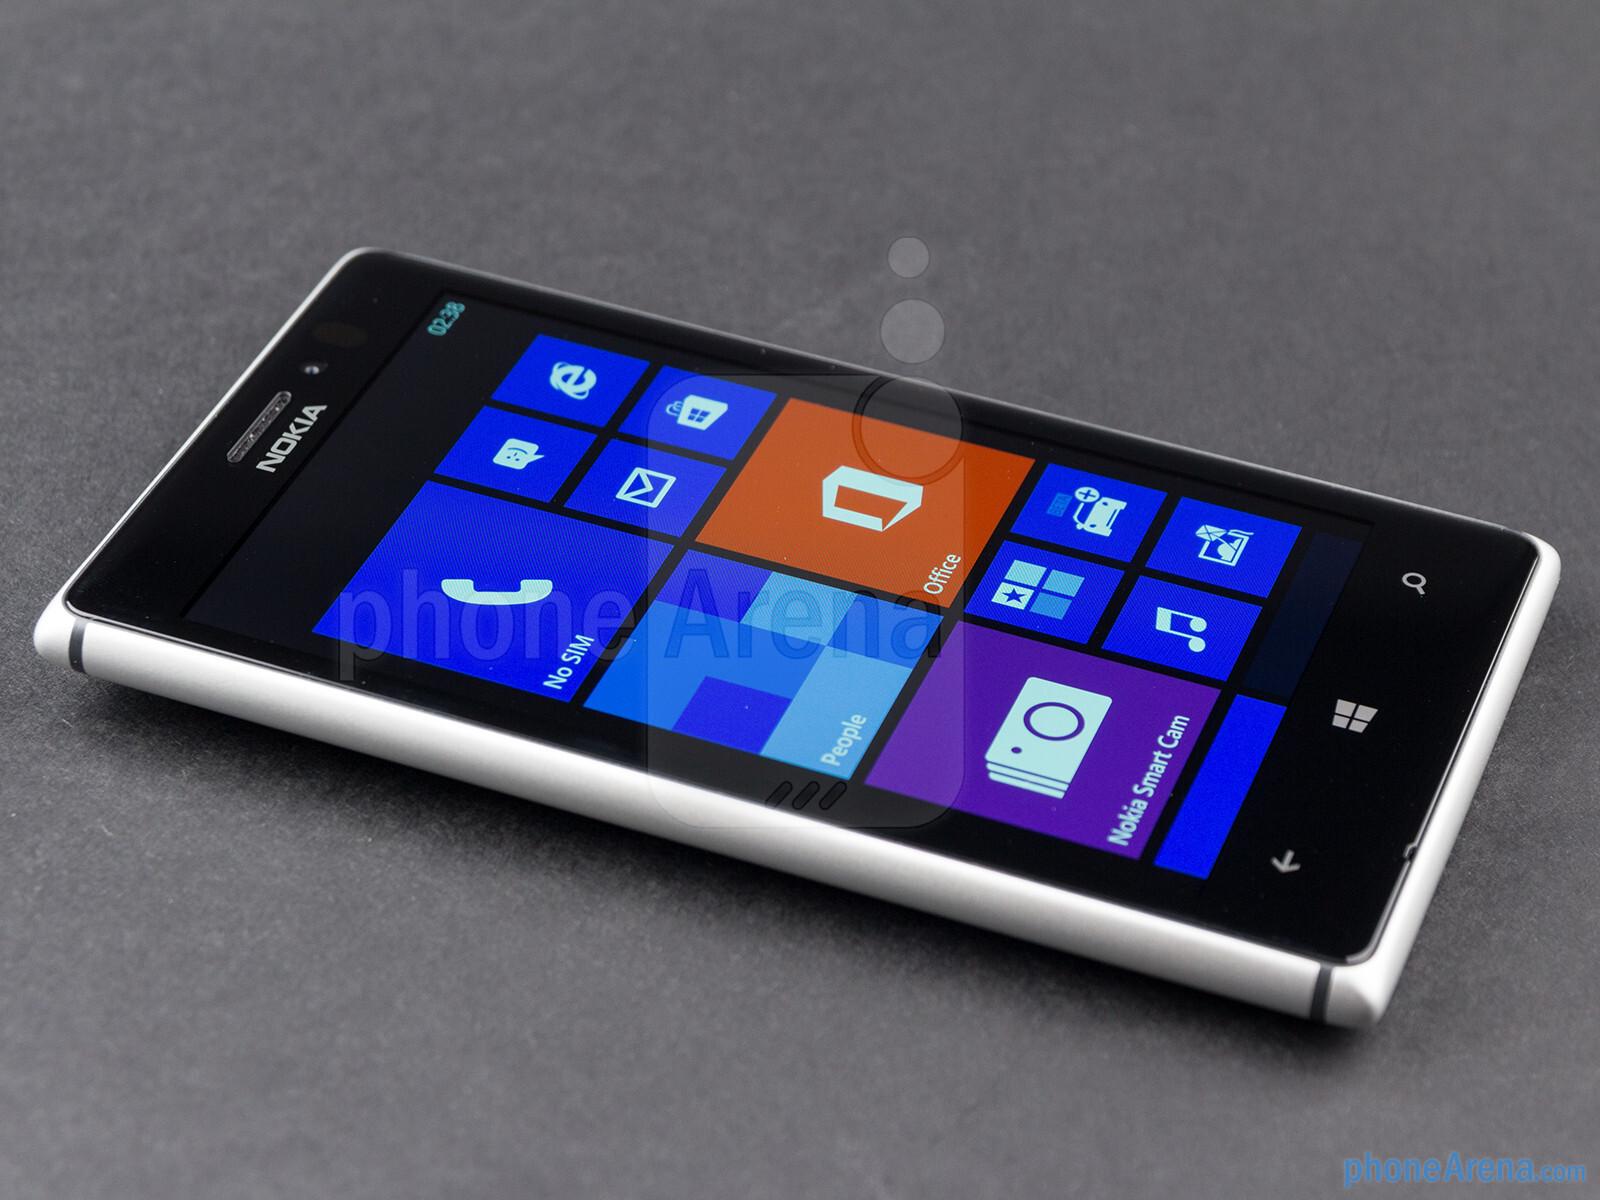 Nokia Lumia 925 Review Call Quality And Conclusion